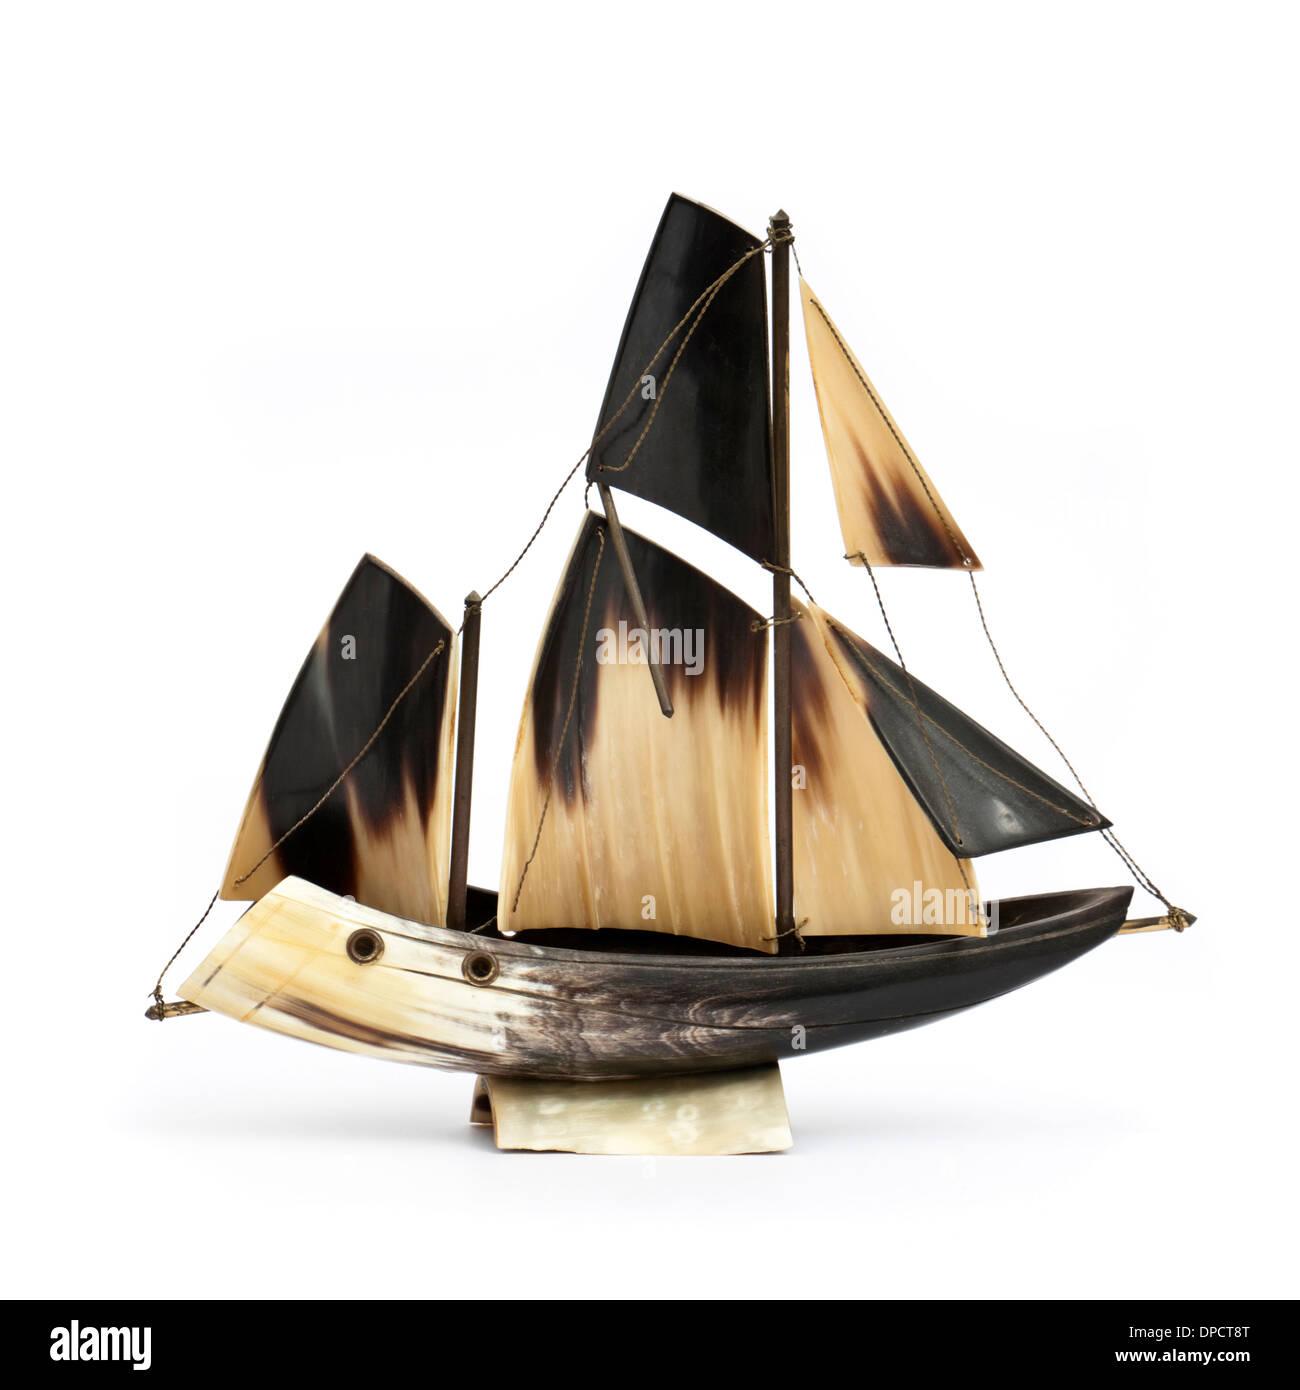 Vintage model sailing ship, handmade from bone or horn - Stock Image